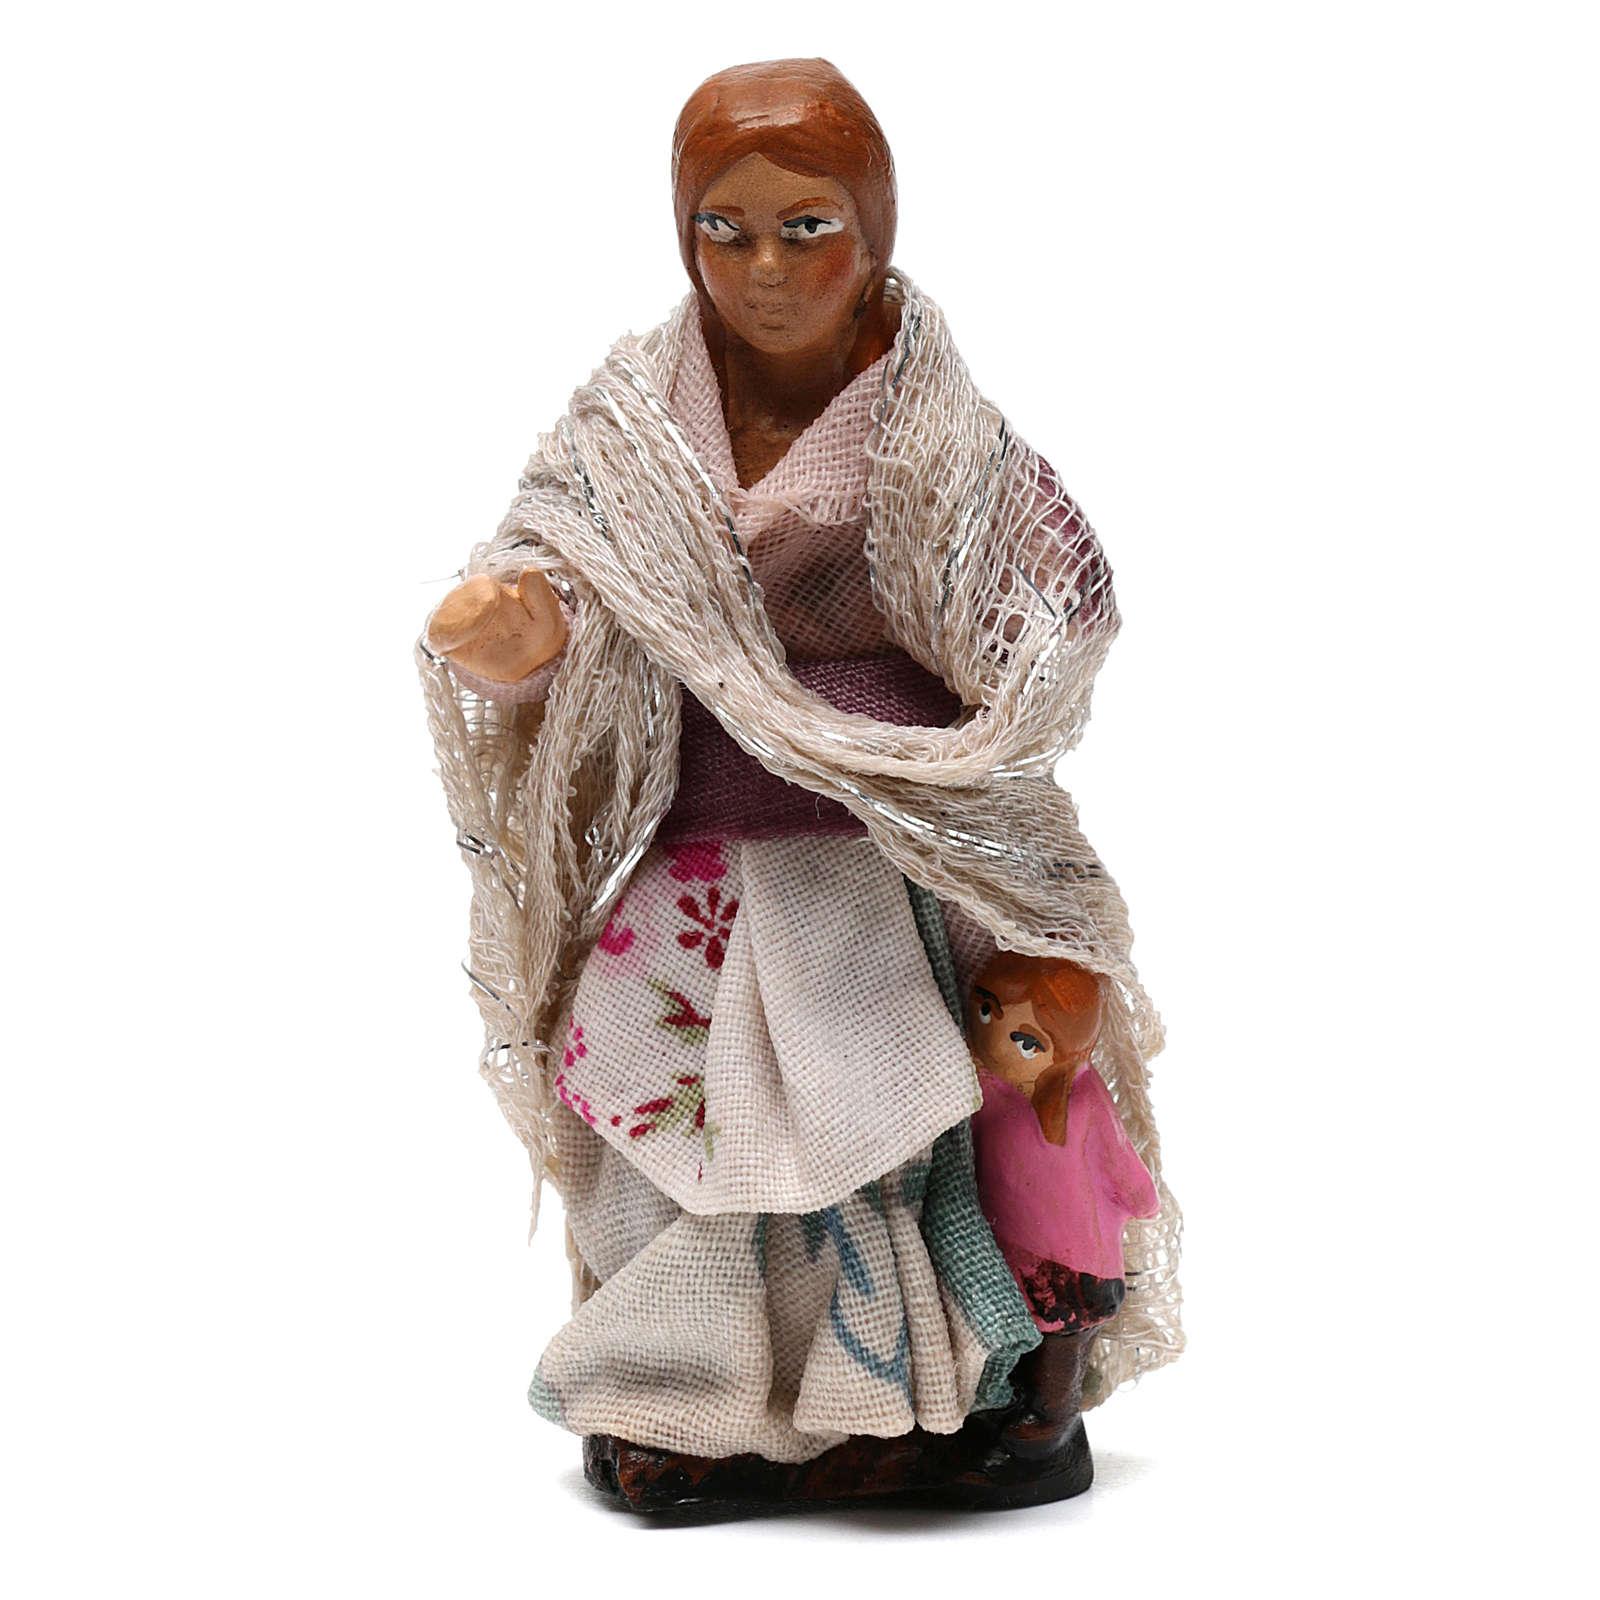 Bambina con bambola per presepe napoletano di 8 cm 4